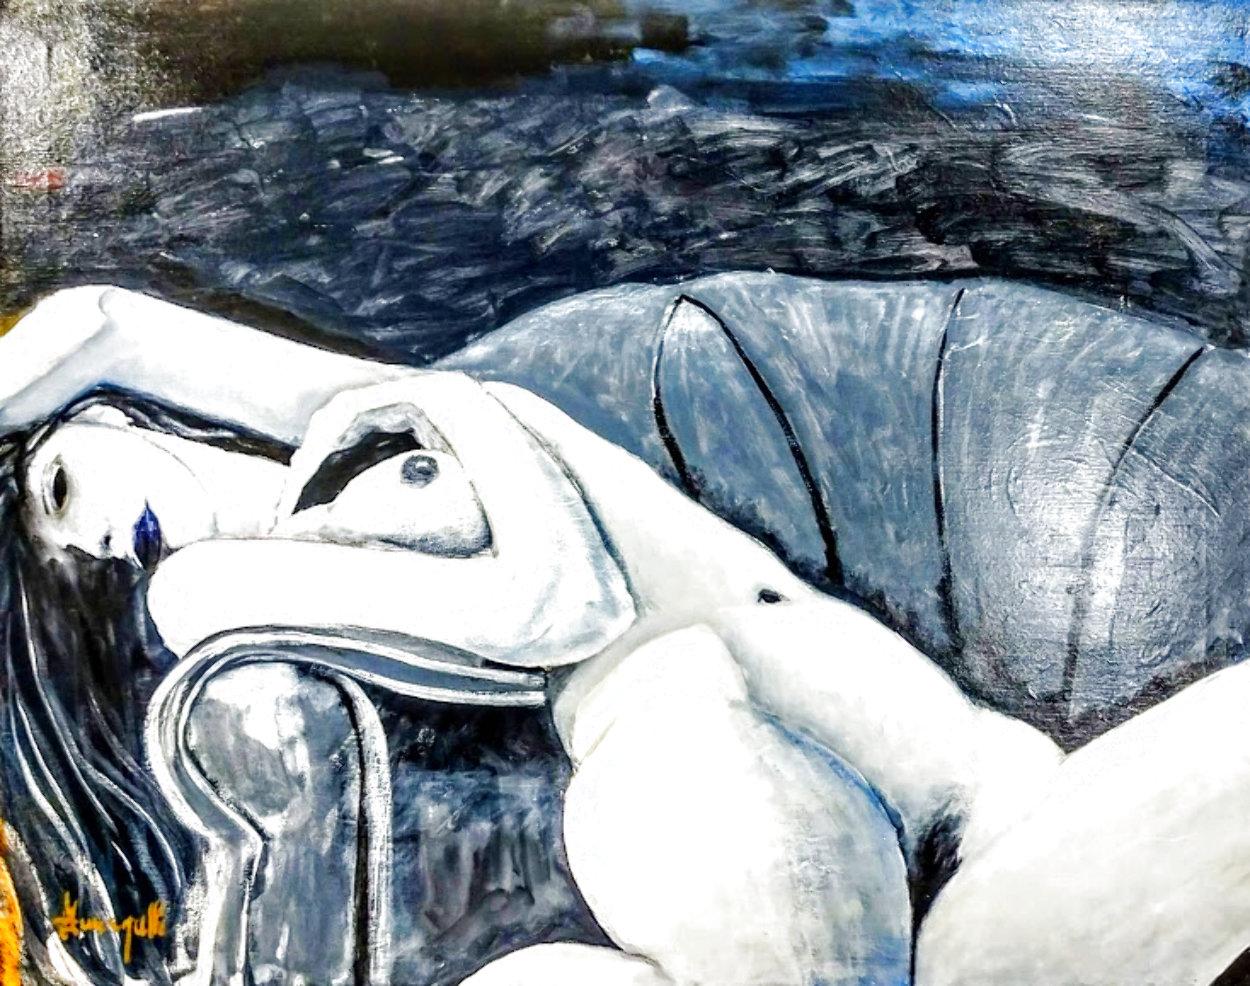 Reclining Nude 24x30 Original Painting by Luigi Fumagalli